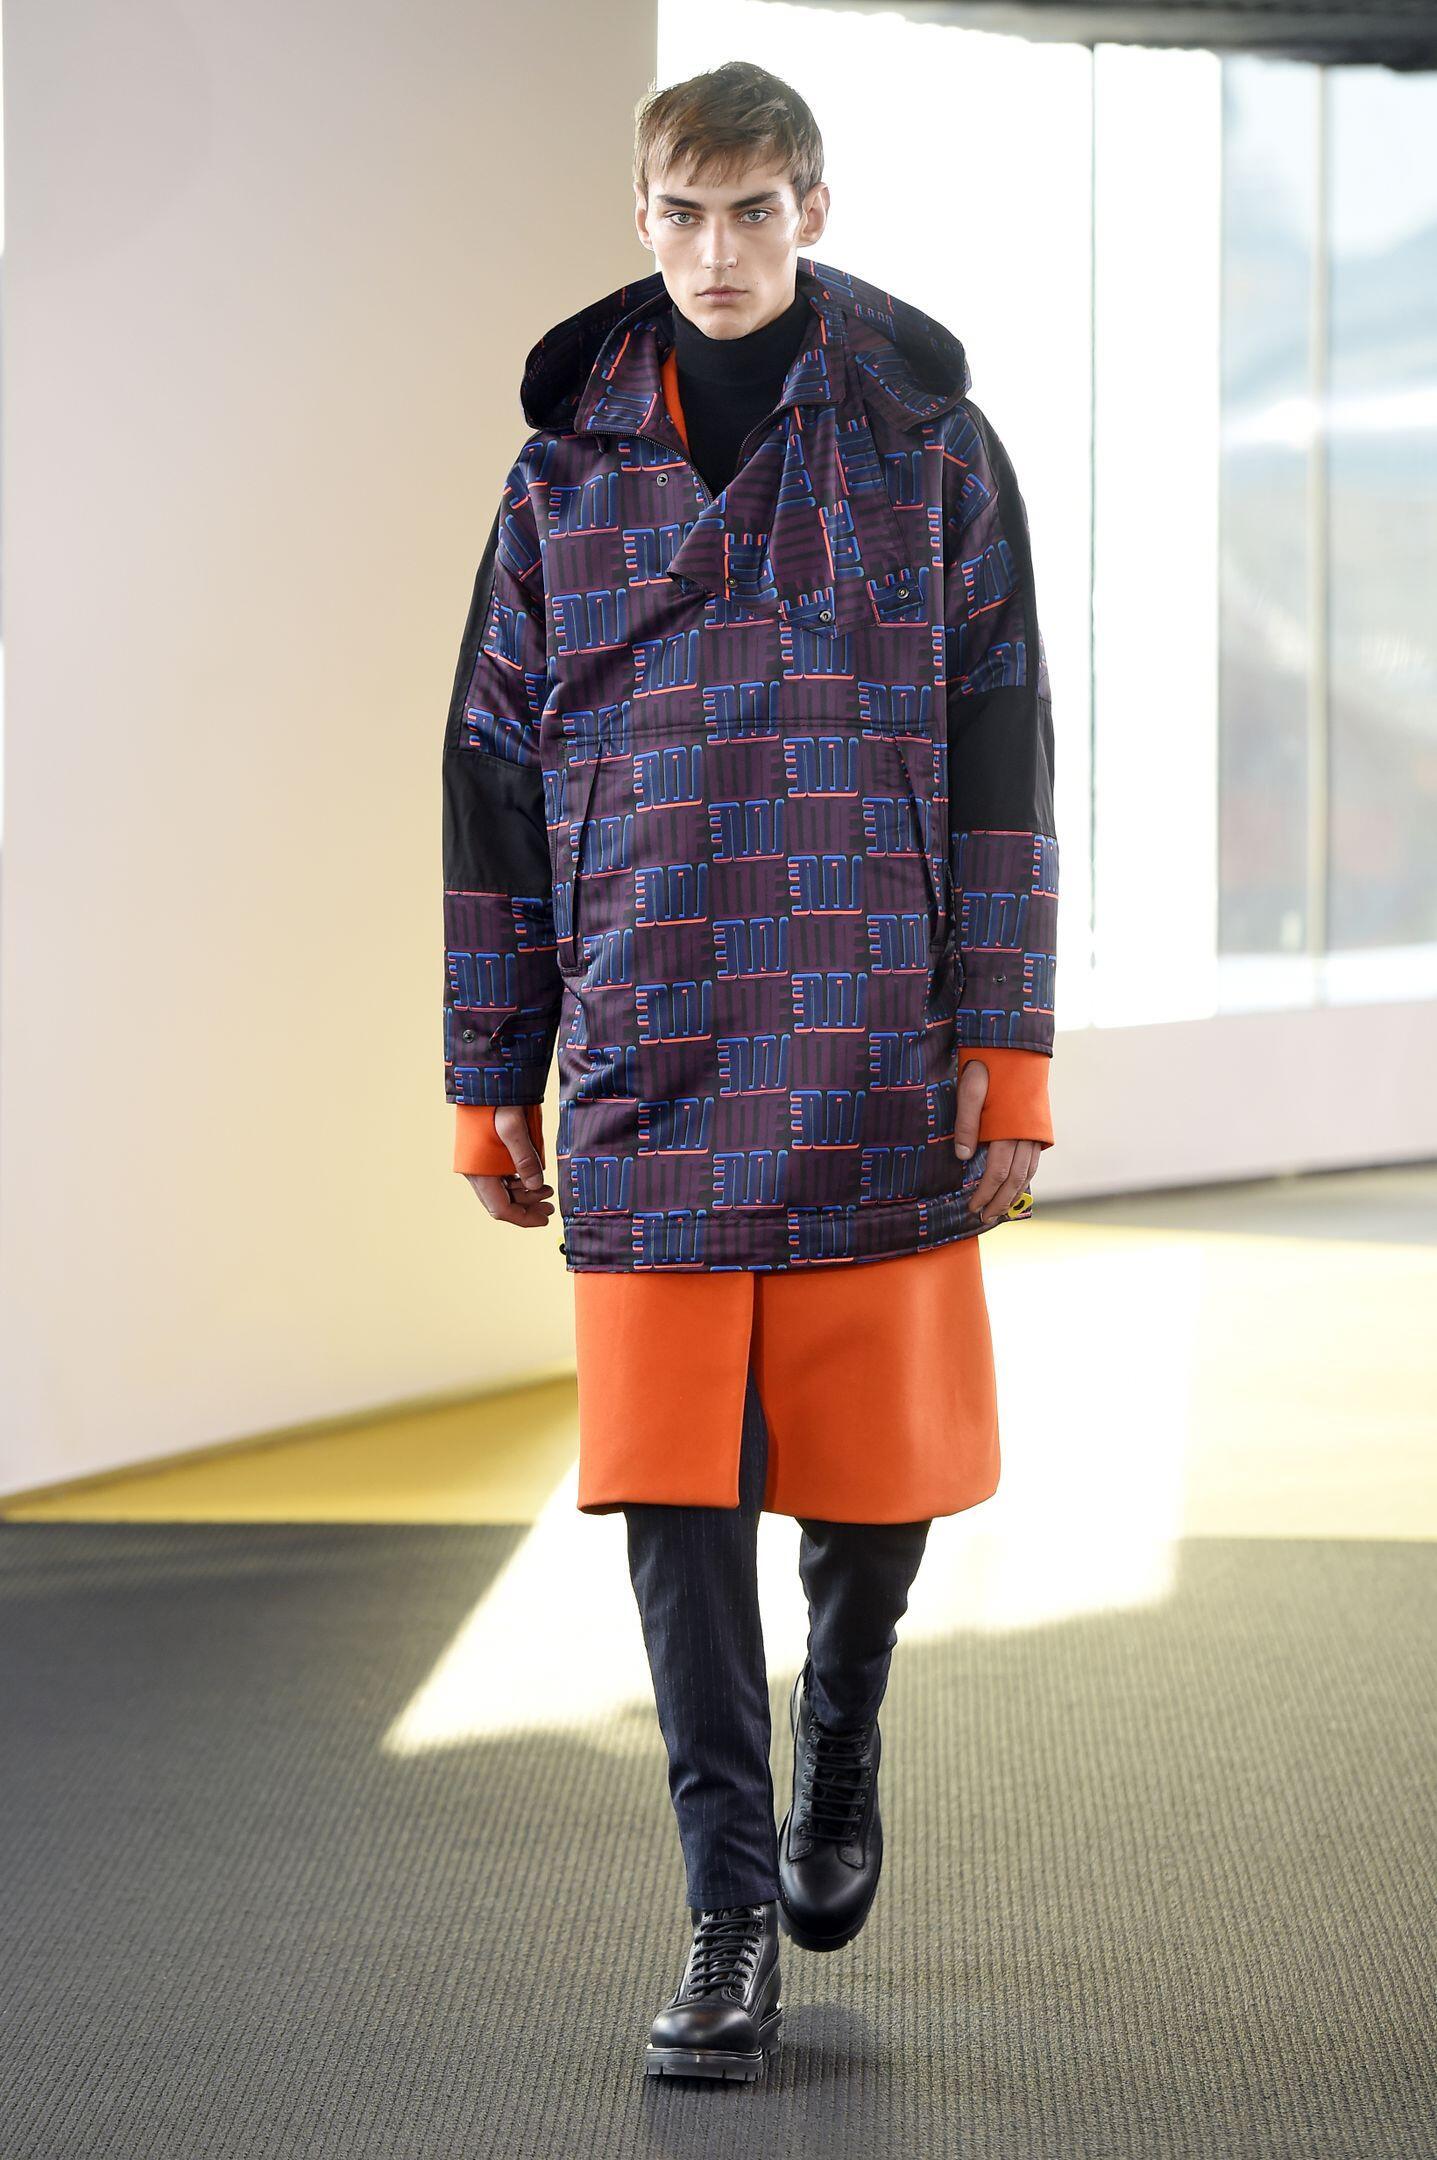 Catwalk Kenzo Fall Winter 2015 16 Men's Collection Paris Fashion Week